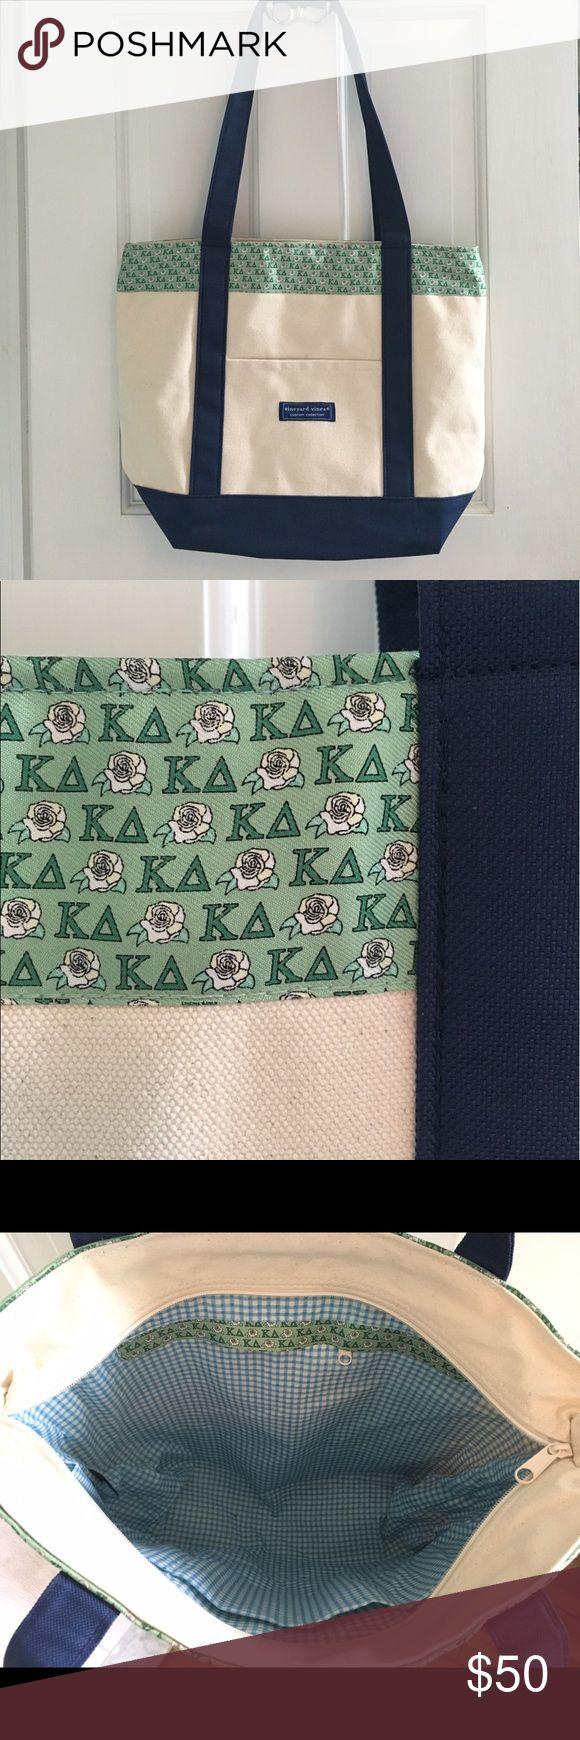 Vineyard Vines Kappa Delta tote bag Brand new Vineyard Vines custom collection Kappa Delta bag. Sturdy canvas body and straps and interior zip pocket. Vineyard Vines Bags Totes